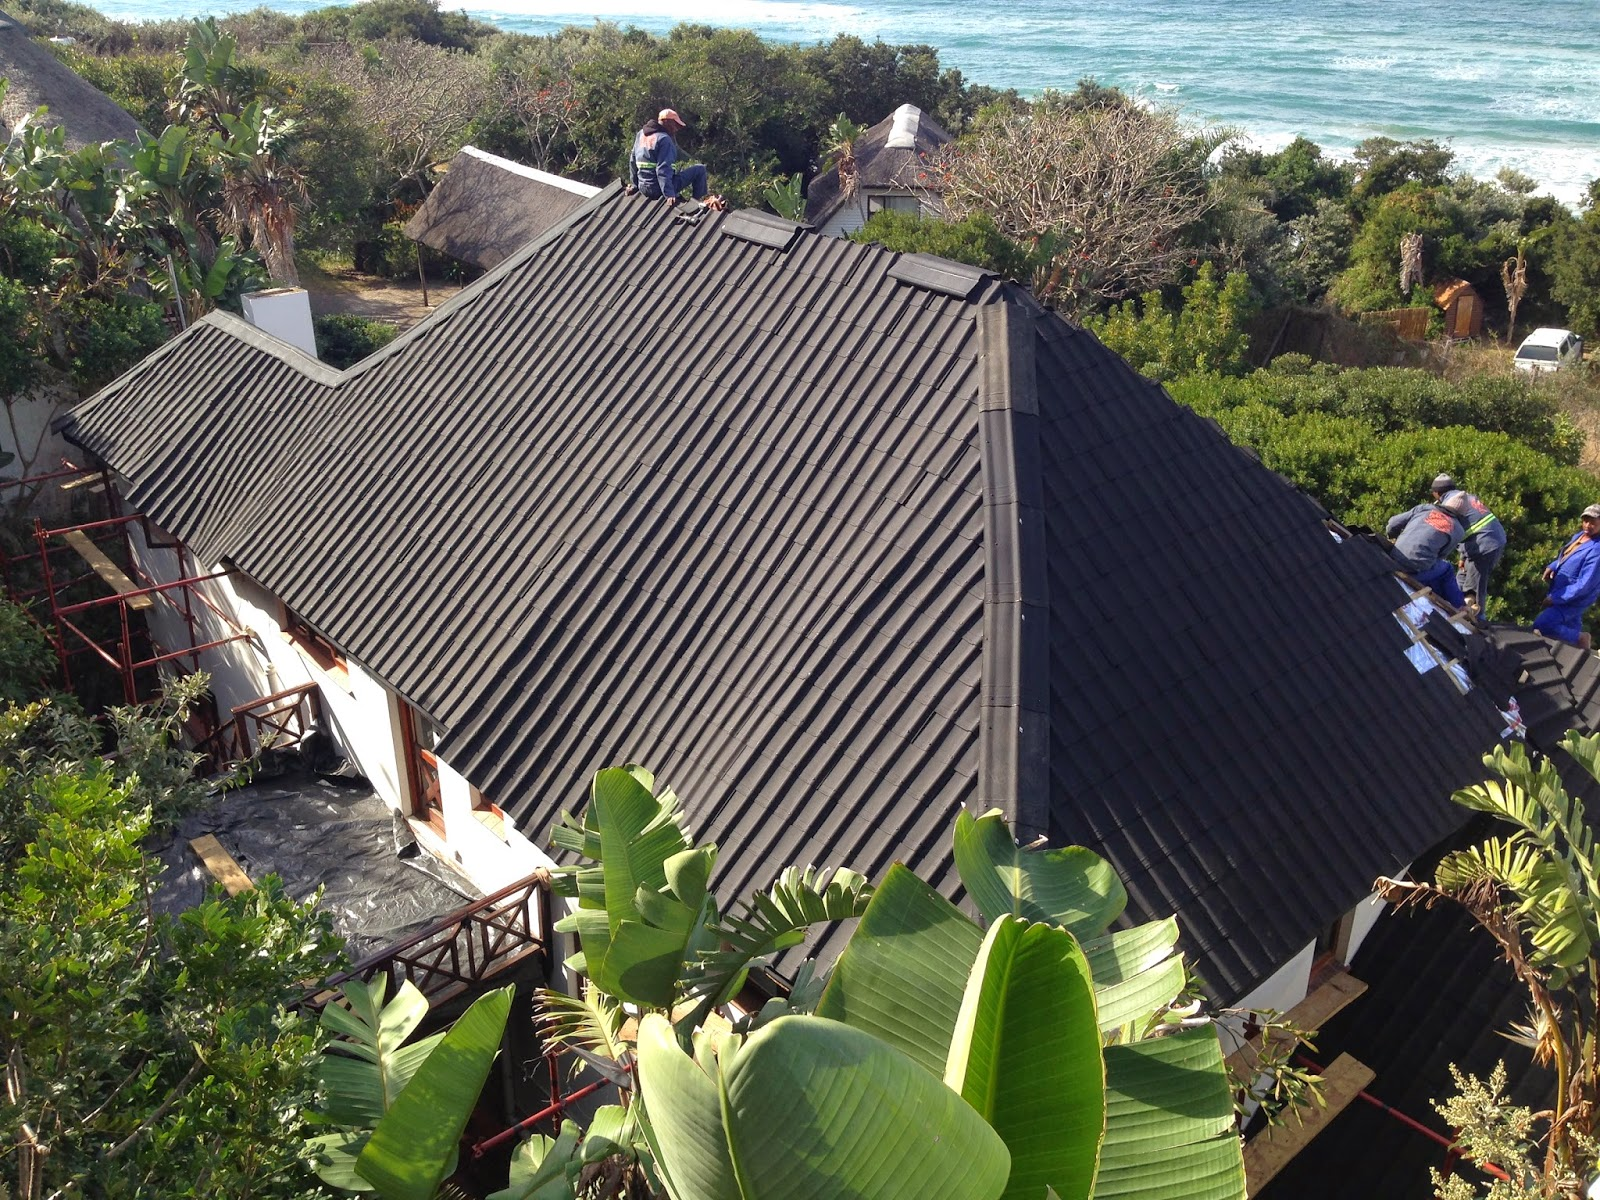 Change A Thatch Roof To Onduvilla Tiles